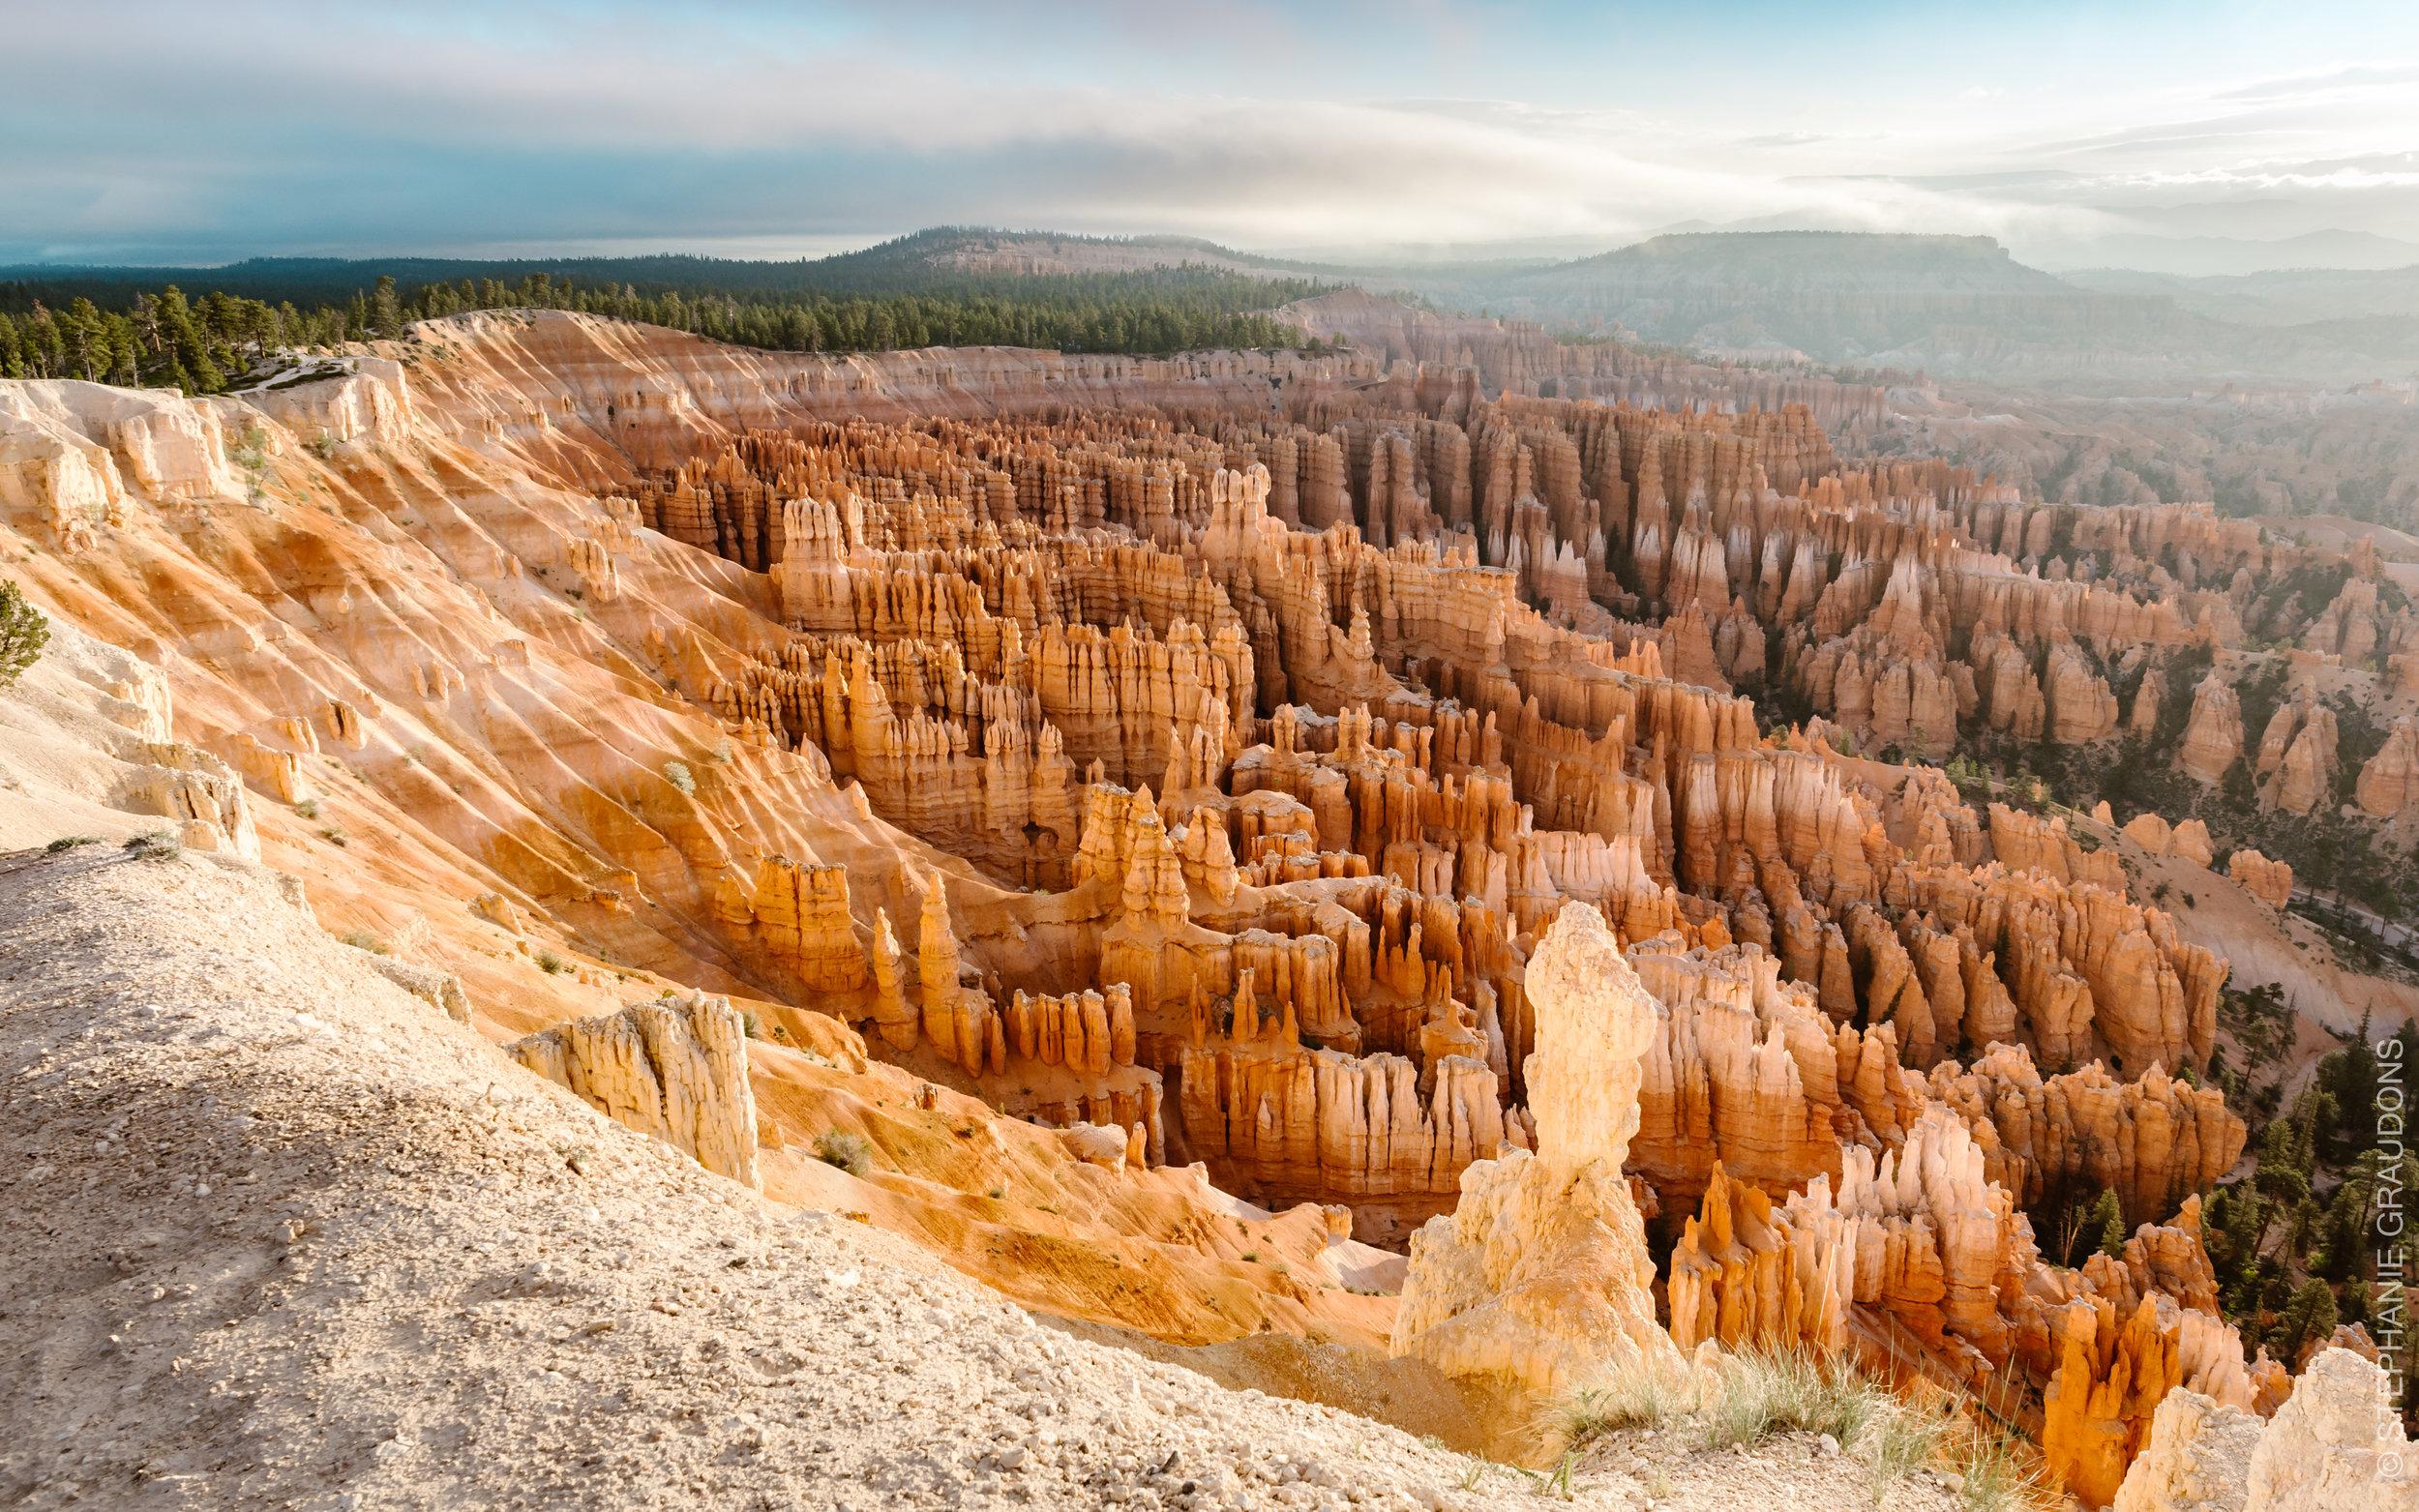 WM-Bryce-Canyon-NP-6944.jpg